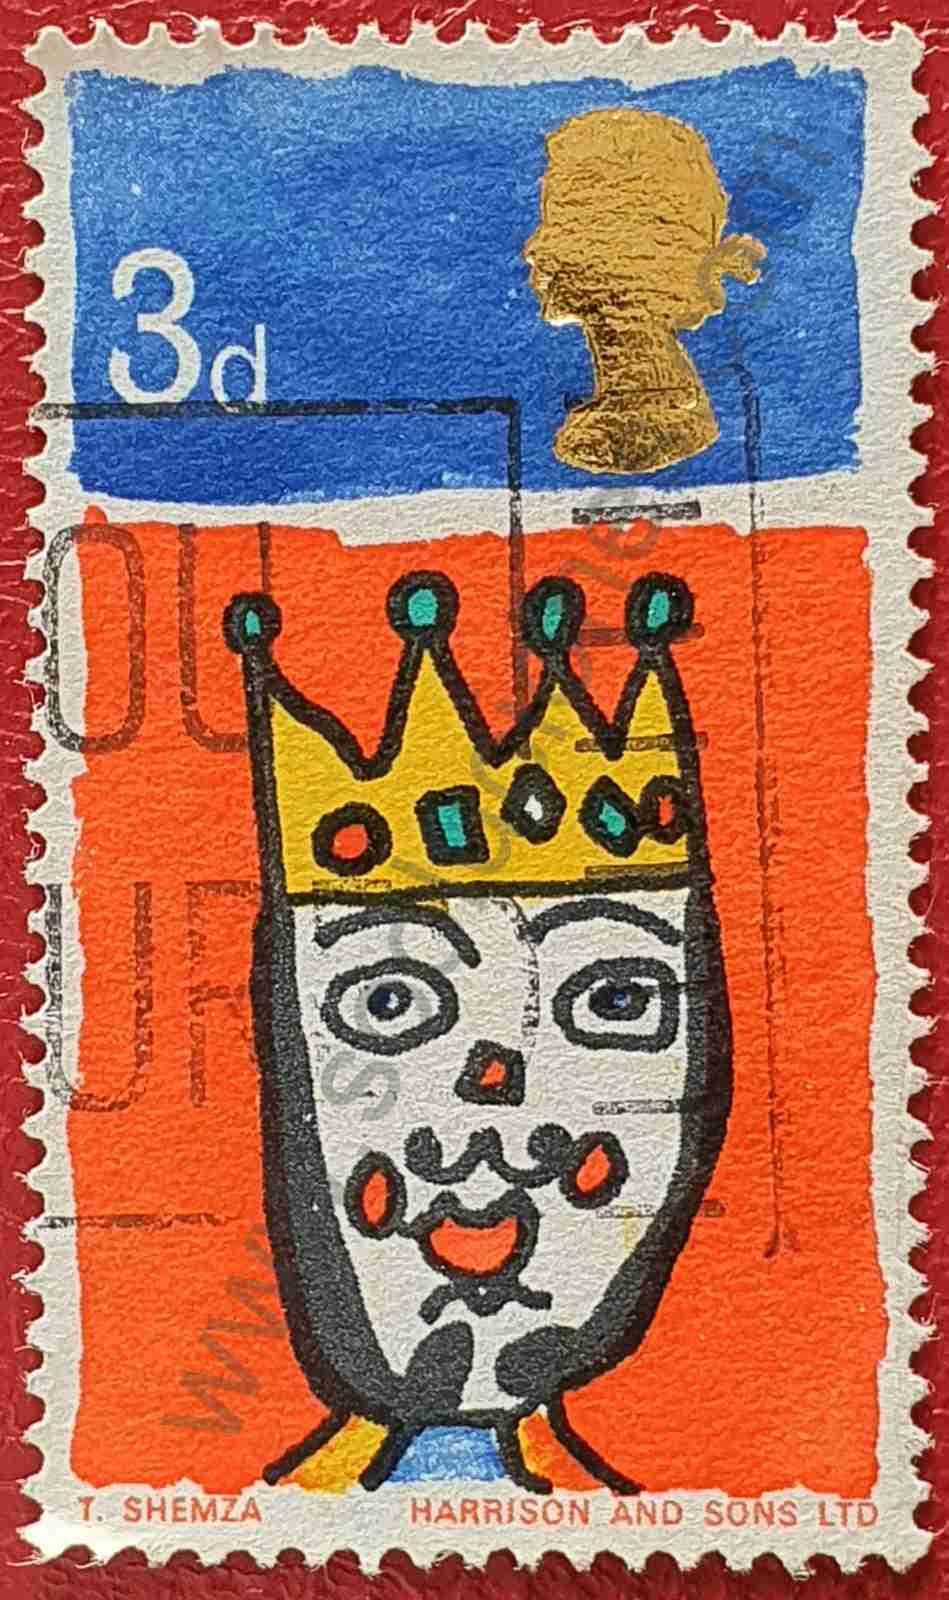 Sello Rey de oriente - Reino Unido 1966